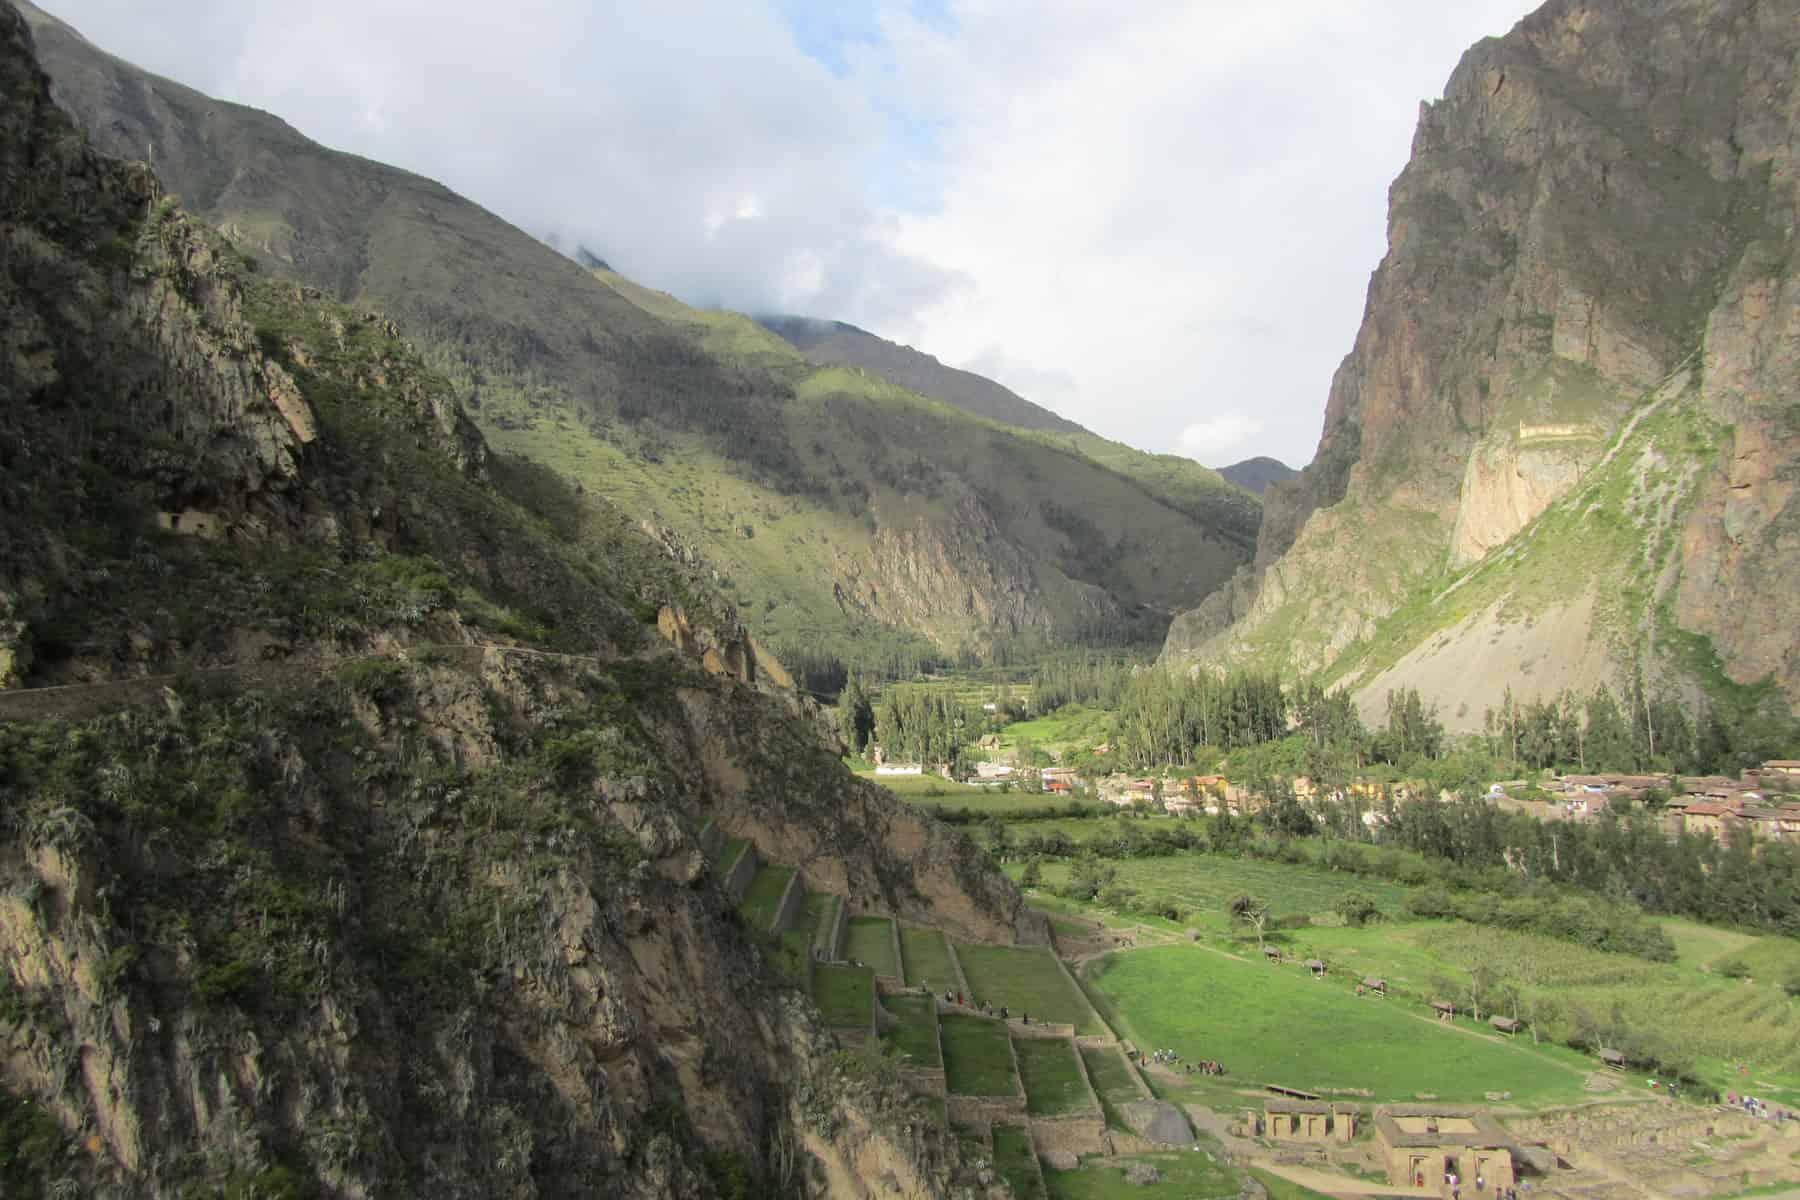 Descending to Sacred Valley Peru